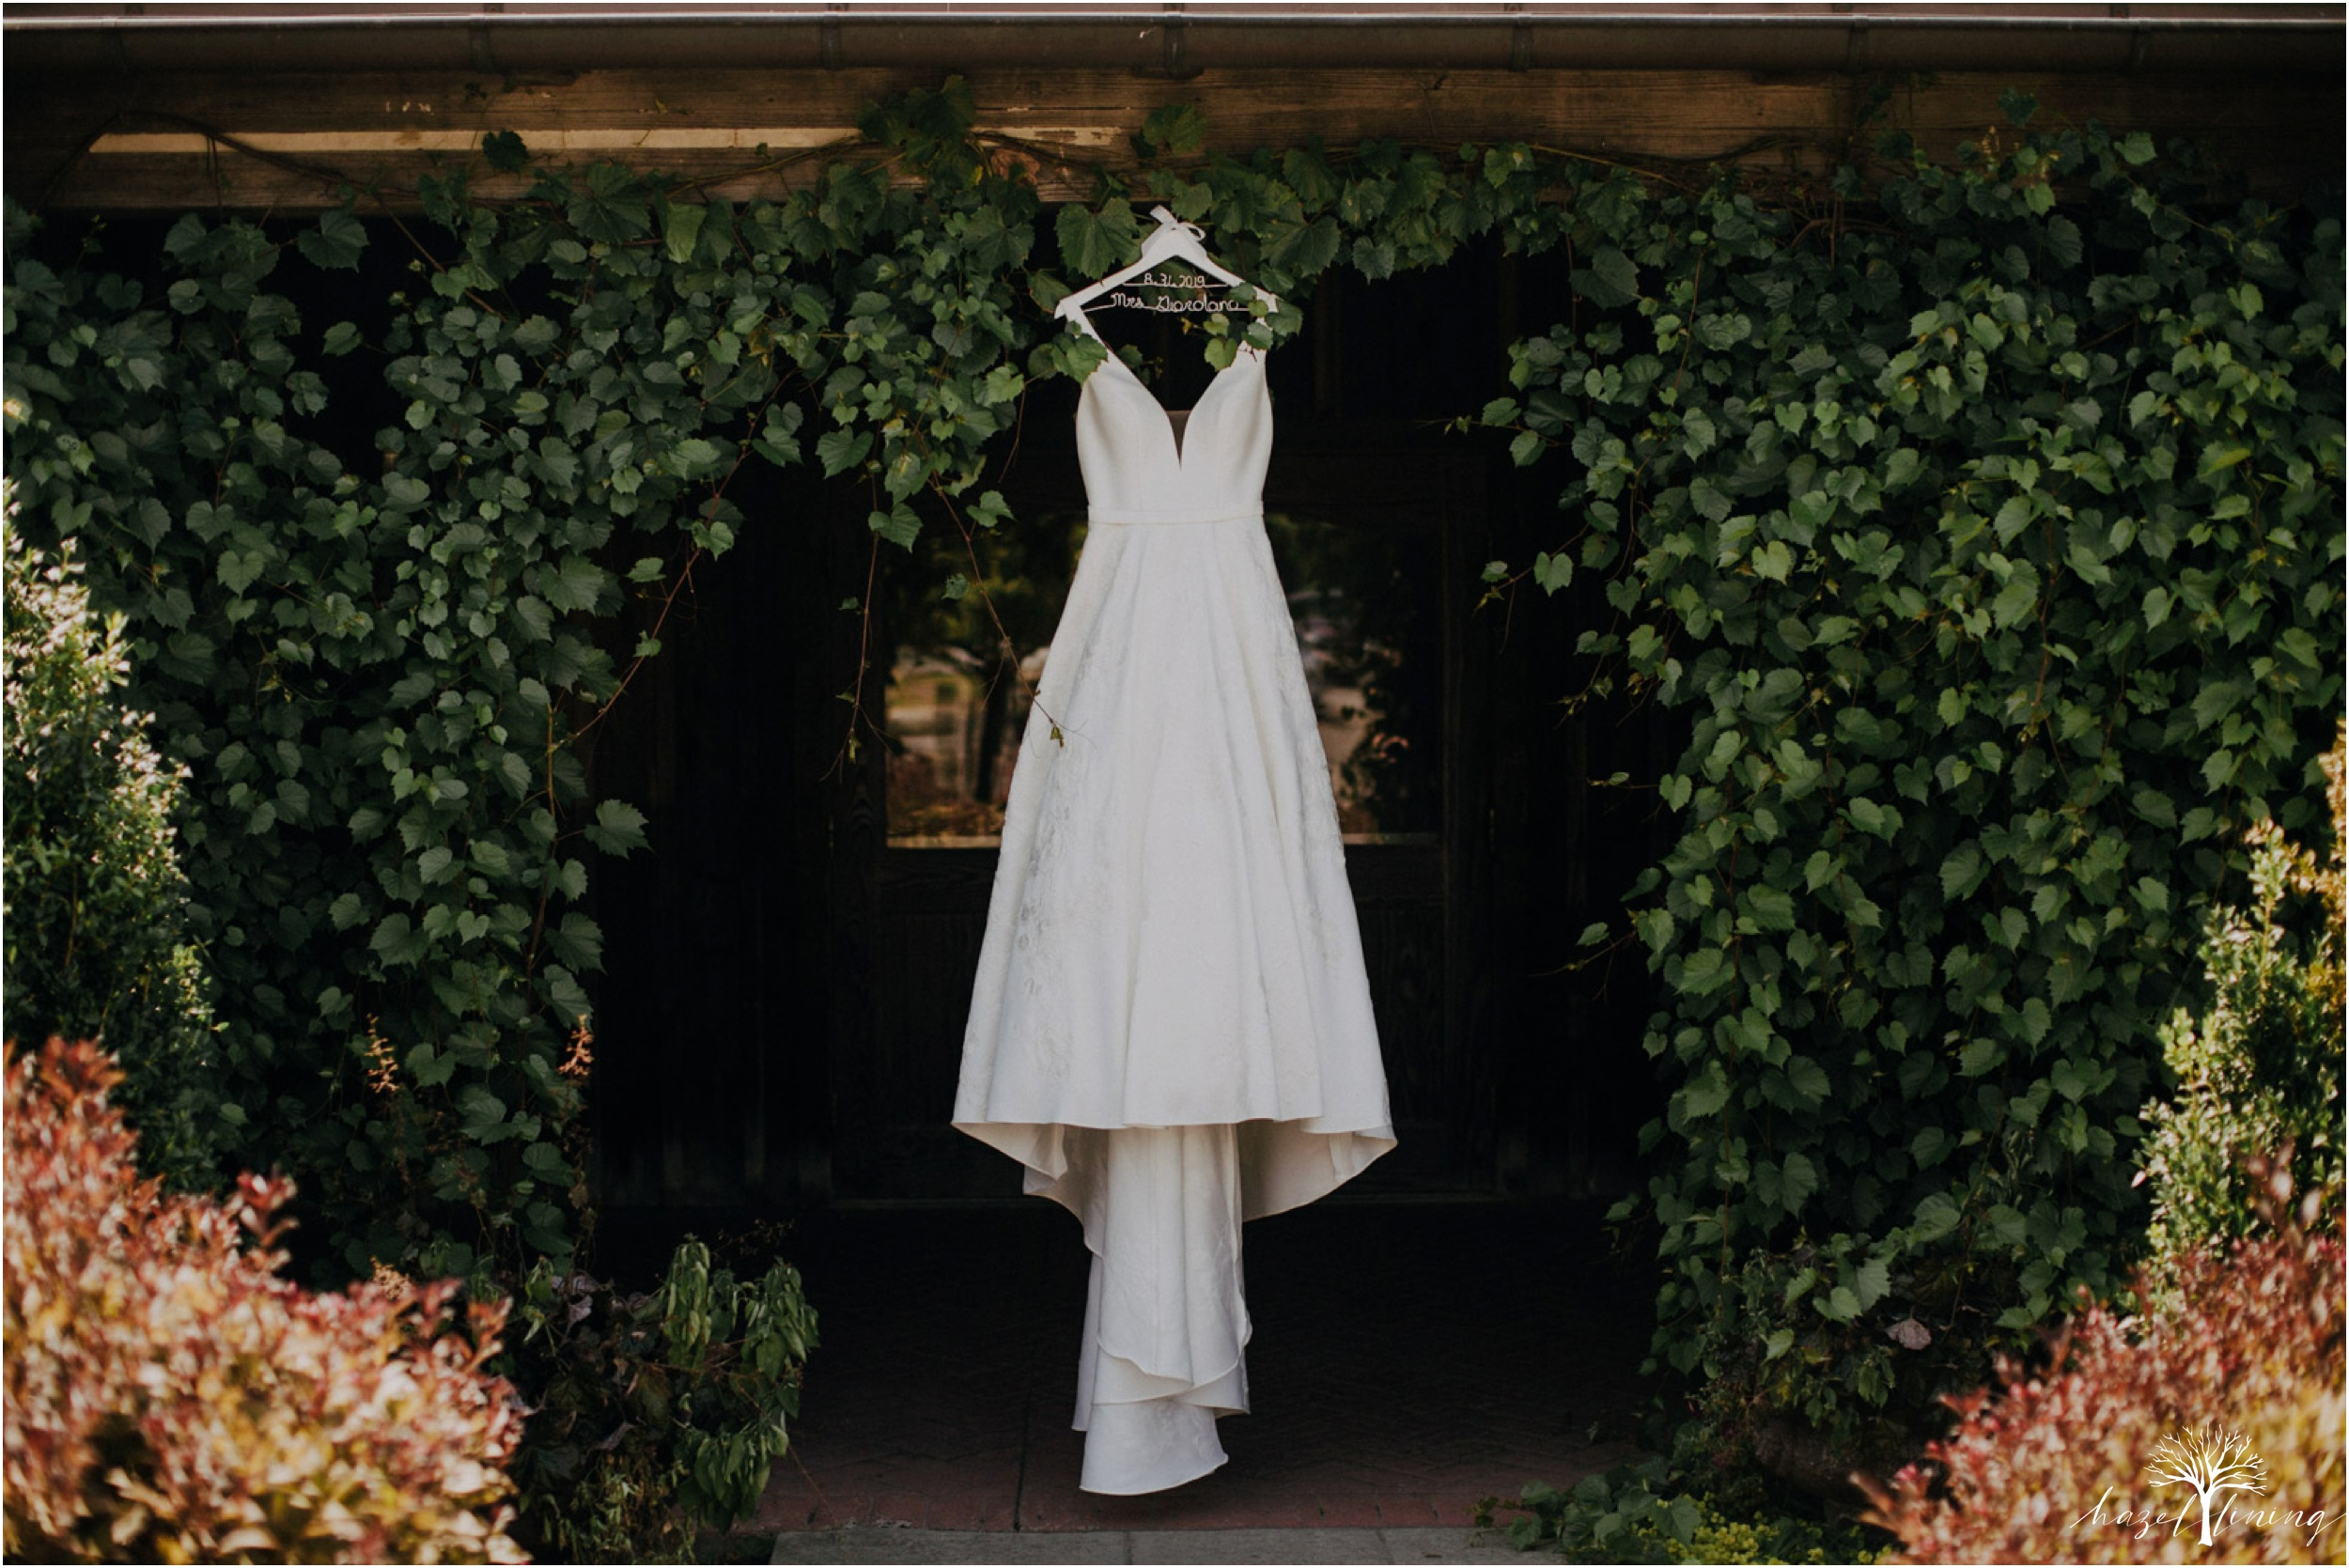 maureen-hepner-anthony-giordano-rose-bank-winery-newtow-pennsylvania-luxury-summer-wedding-hazel-lining-photography-destination-elopement-wedding-engagement-photography_0001.jpg